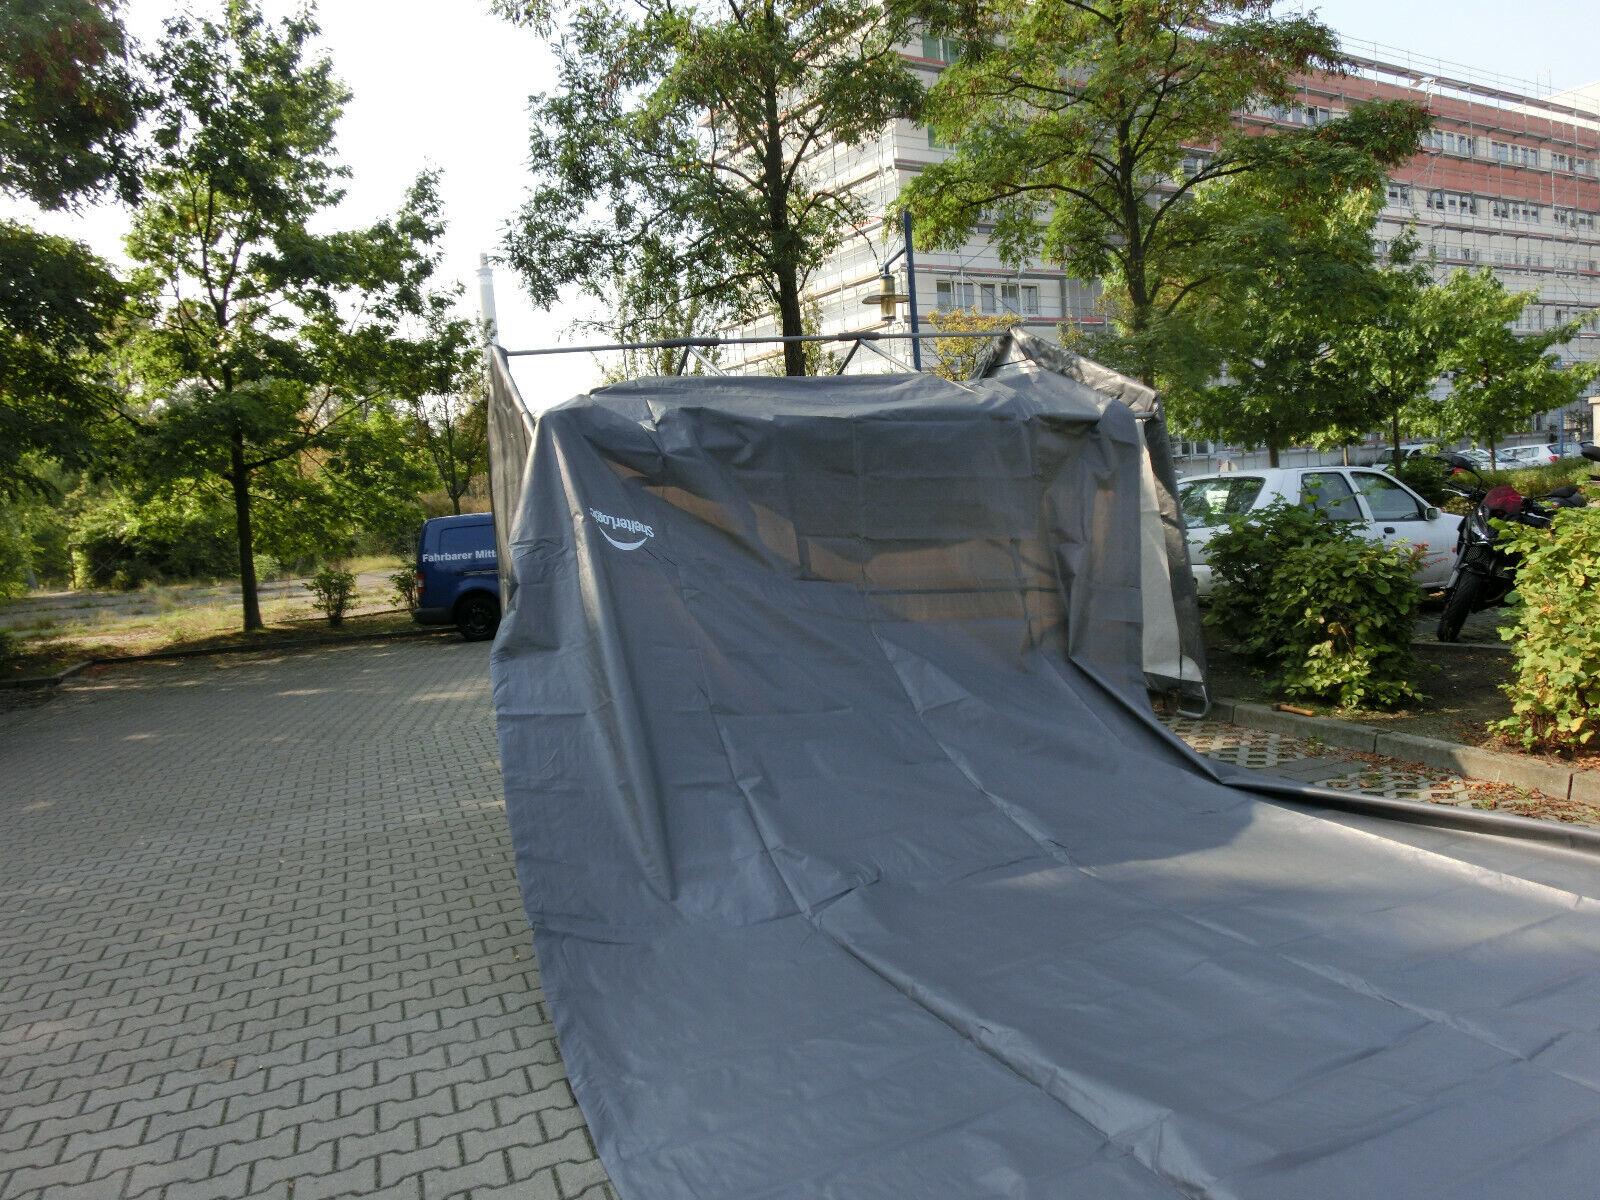 Recambio plane casa forma techo lona Shelterlogic weidezelt  s  3m x 3m x 2,45m